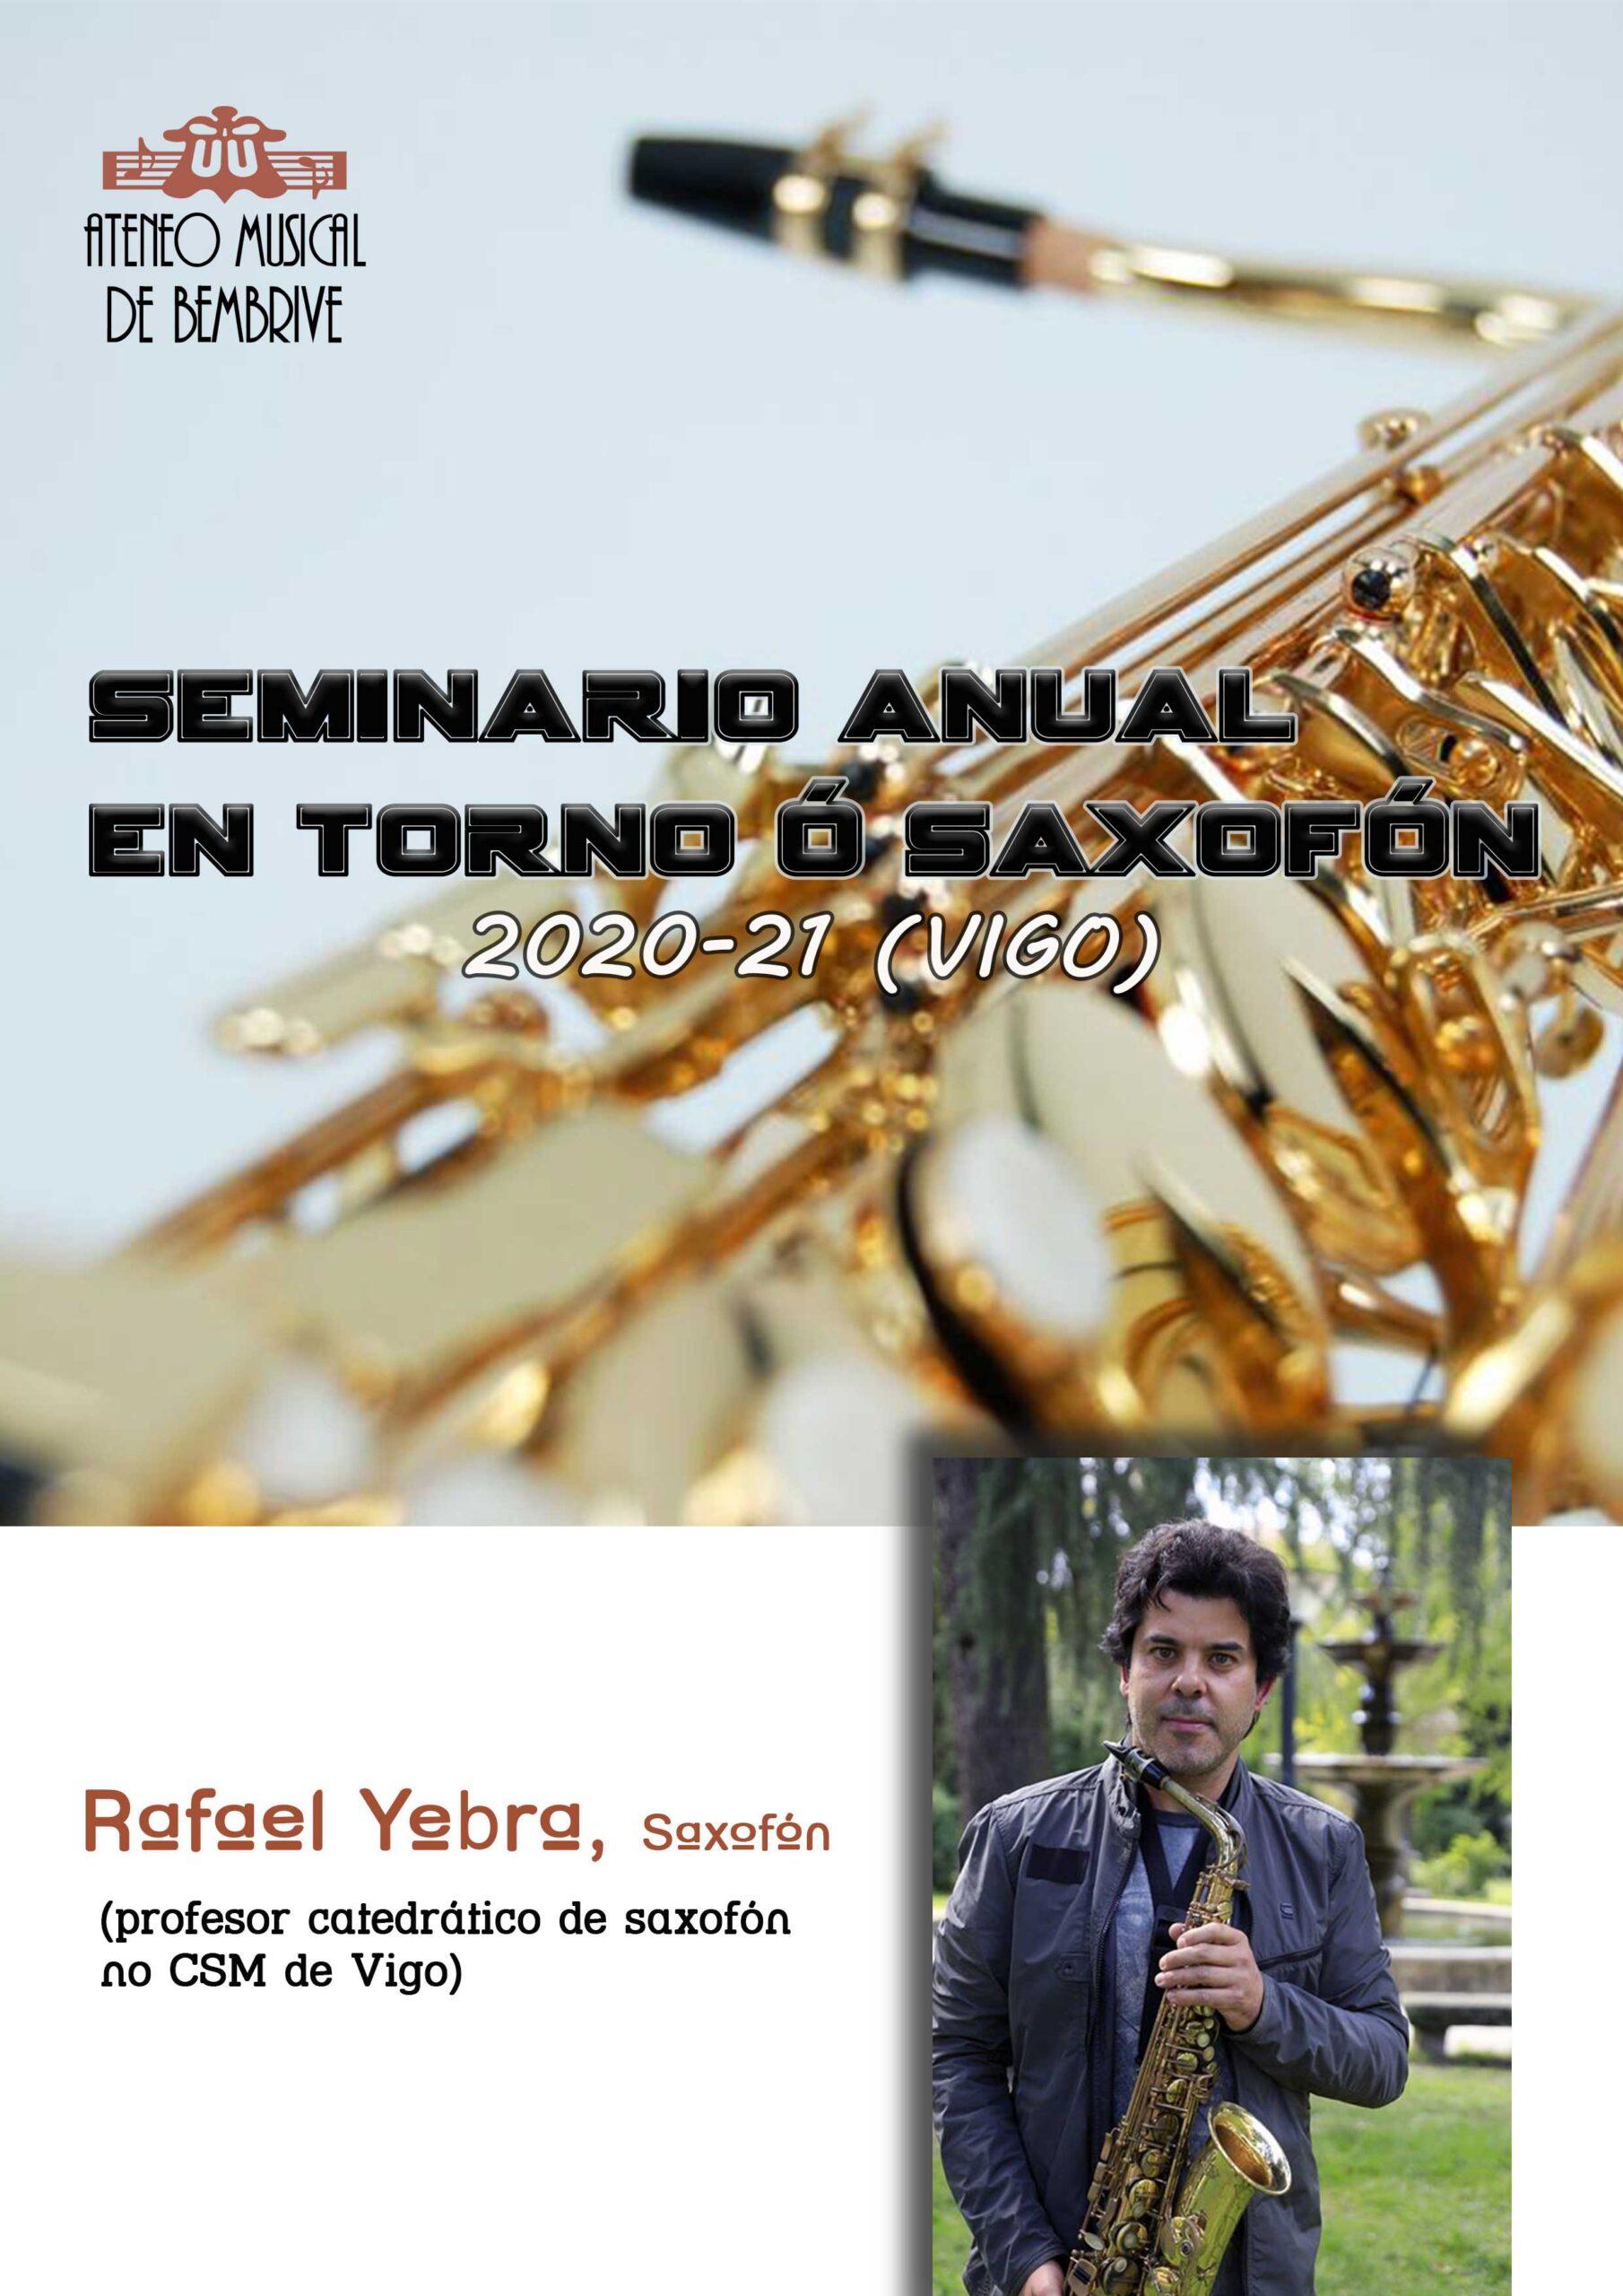 Seminario Anual En Torno Al Saxofón 2020-21